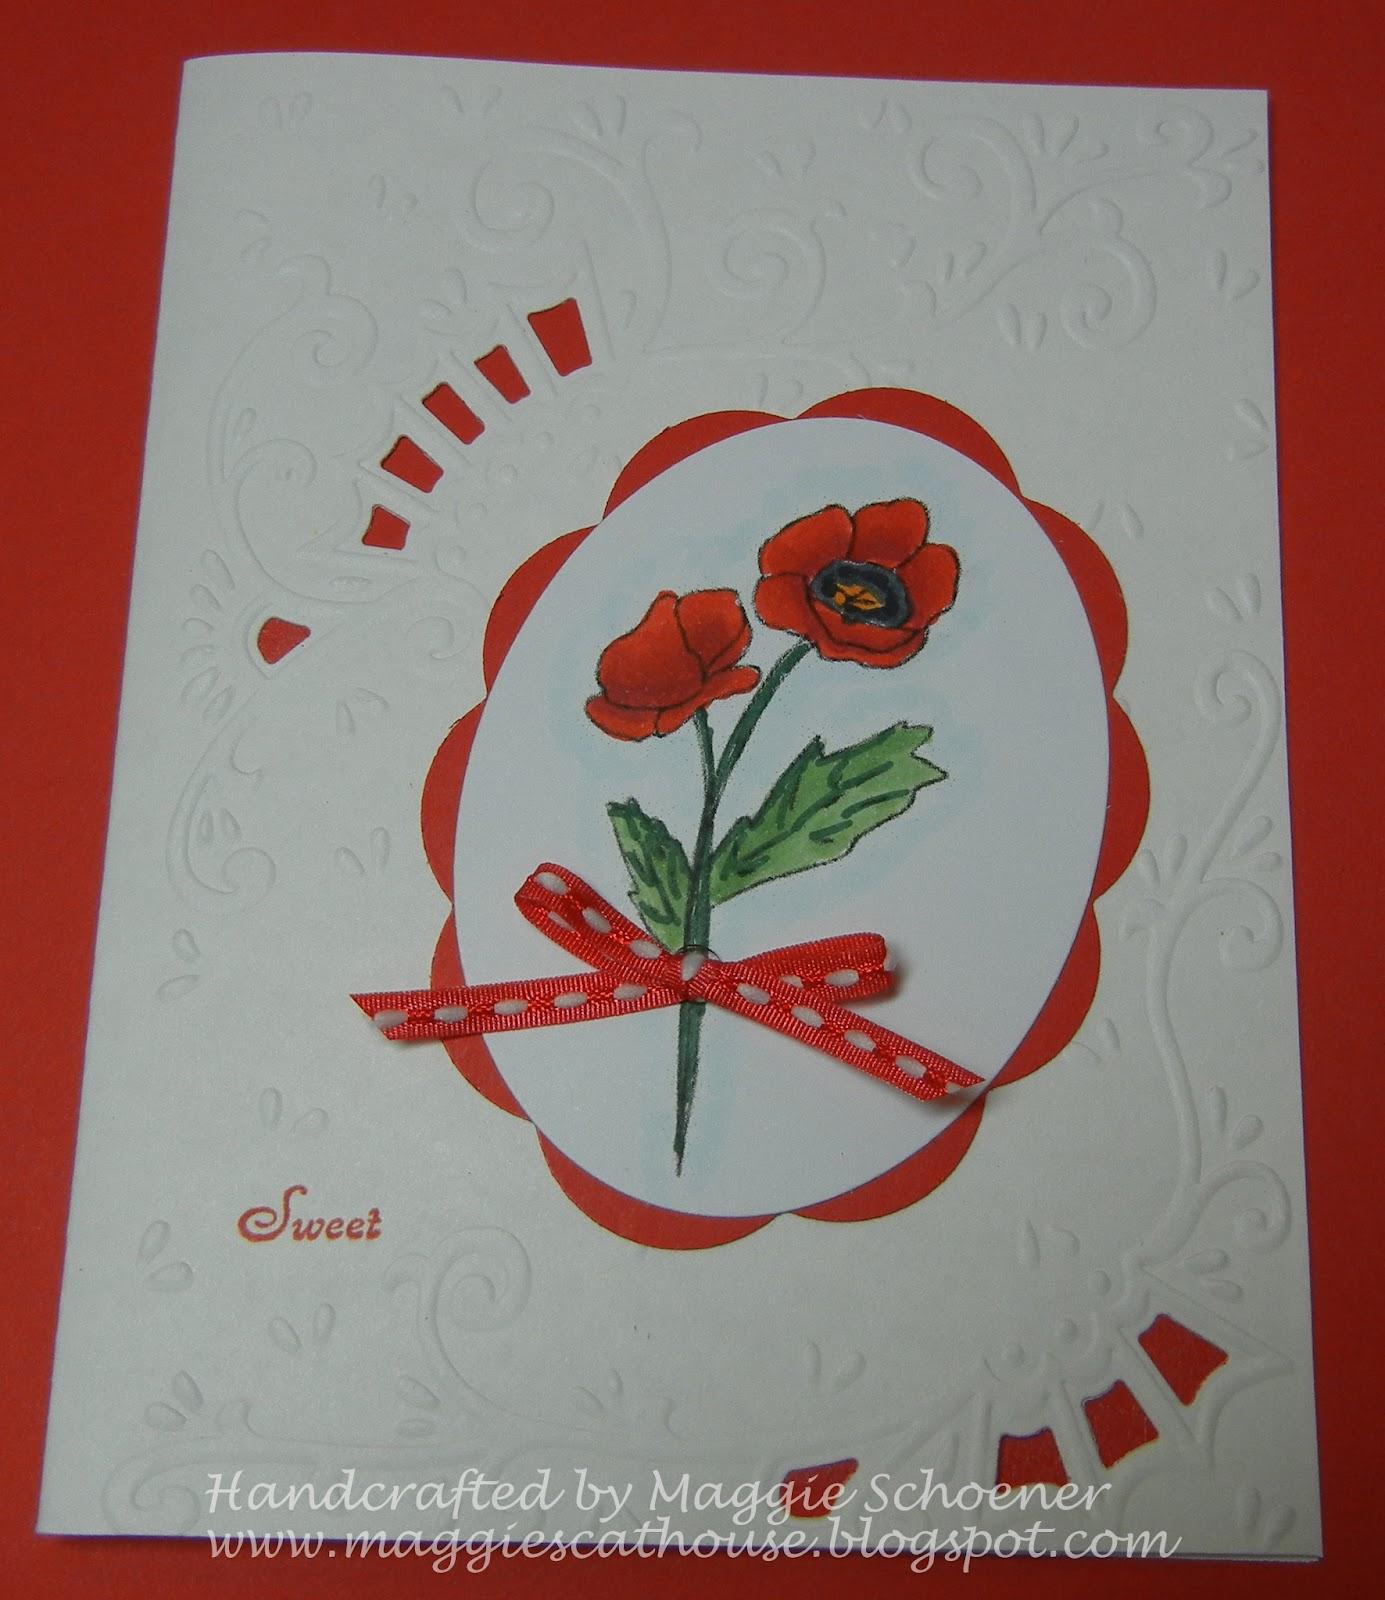 http://1.bp.blogspot.com/-q-8aeBLNYiw/UFVTlb2XvNI/AAAAAAAABLA/eCin8CR1TEI/s1600/Poppies.jpg